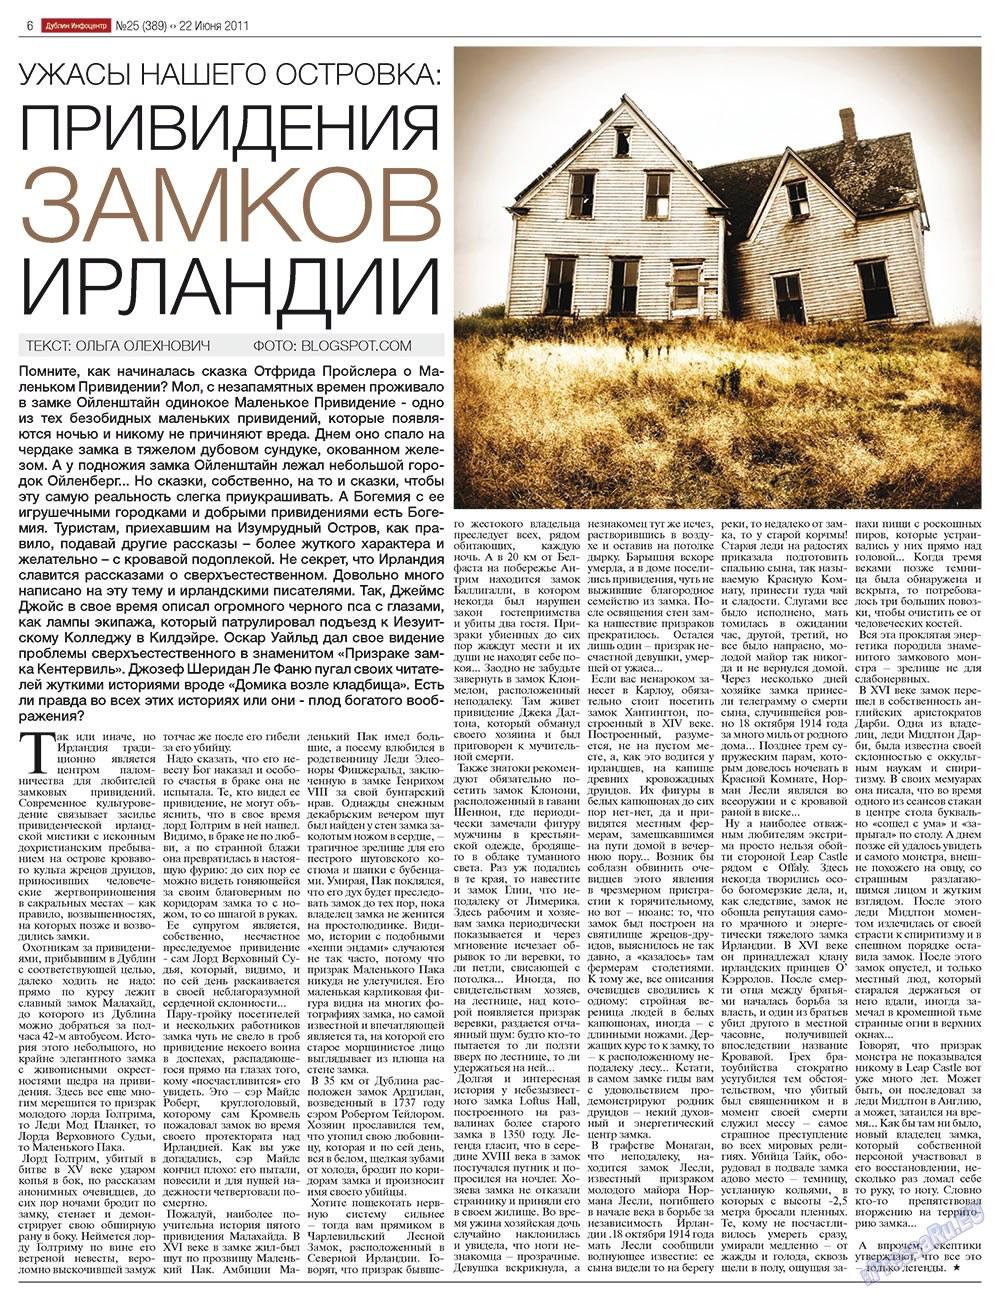 Дублин инфоцентр (газета). 2011 год, номер 25, стр. 6